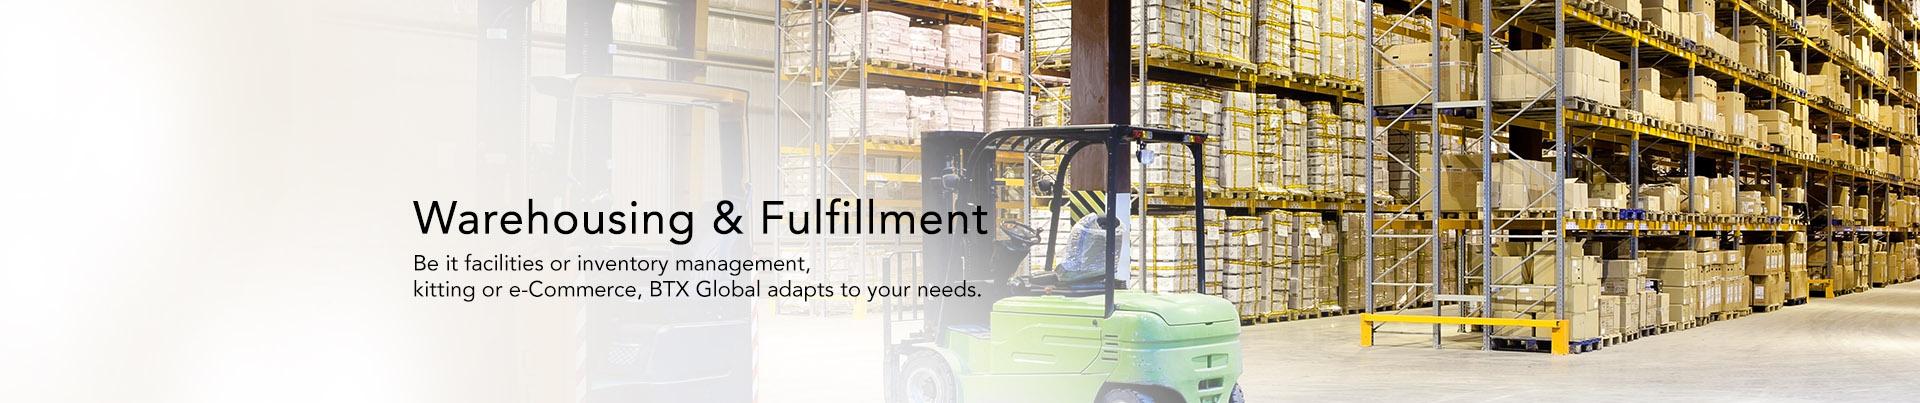 Warehousing & Fulfillment at BTX Global Logistics